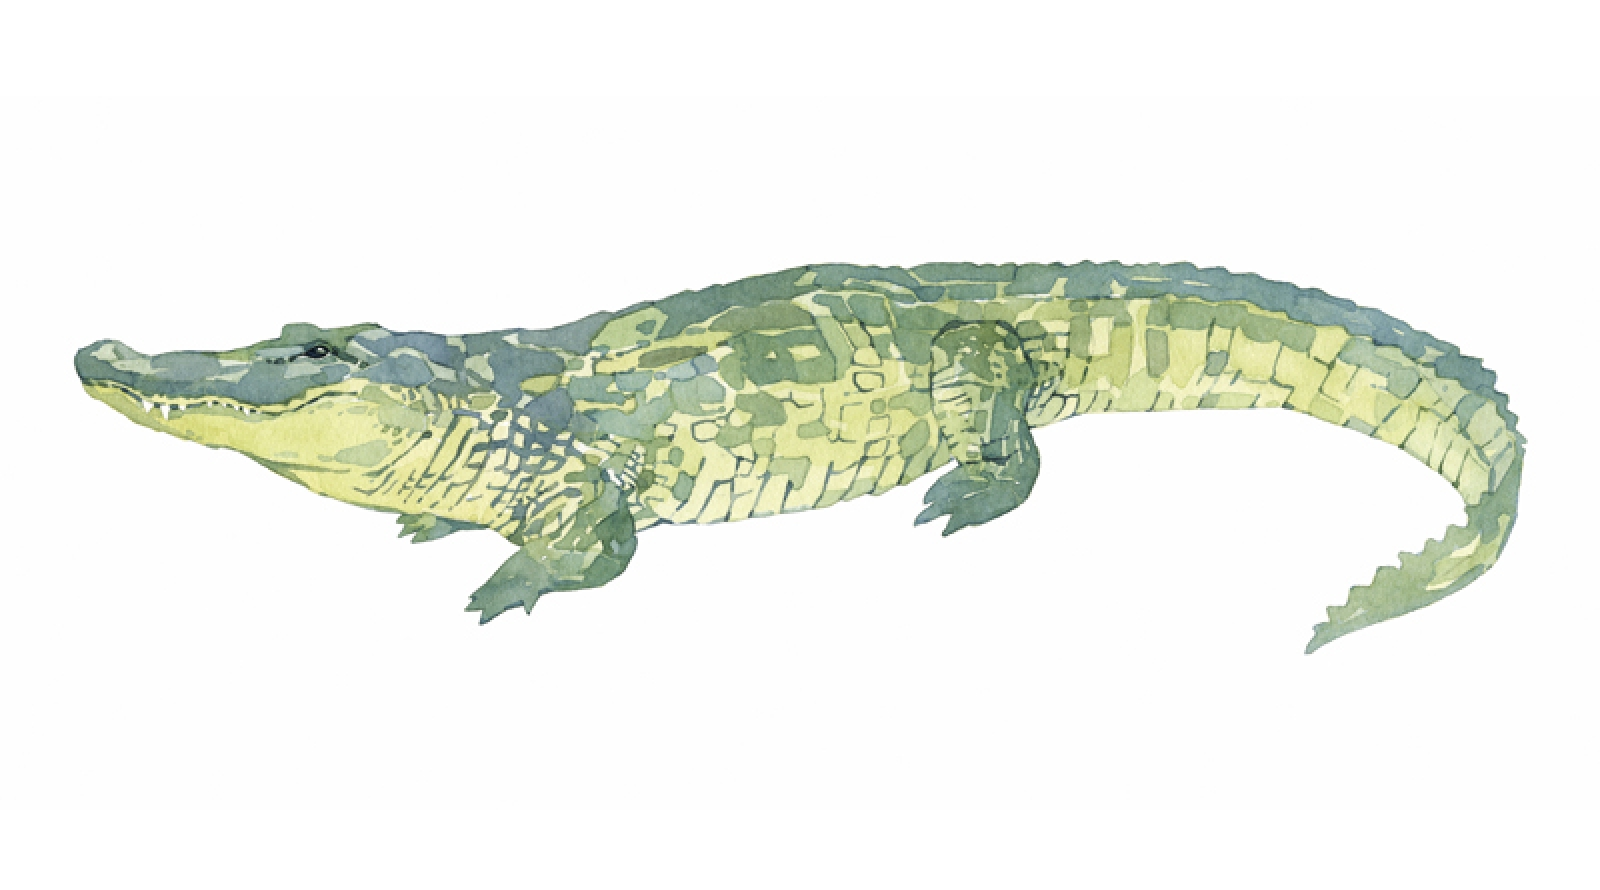 1600x890 Alligator Watercolor Painting Print David Scheirer Watercolors